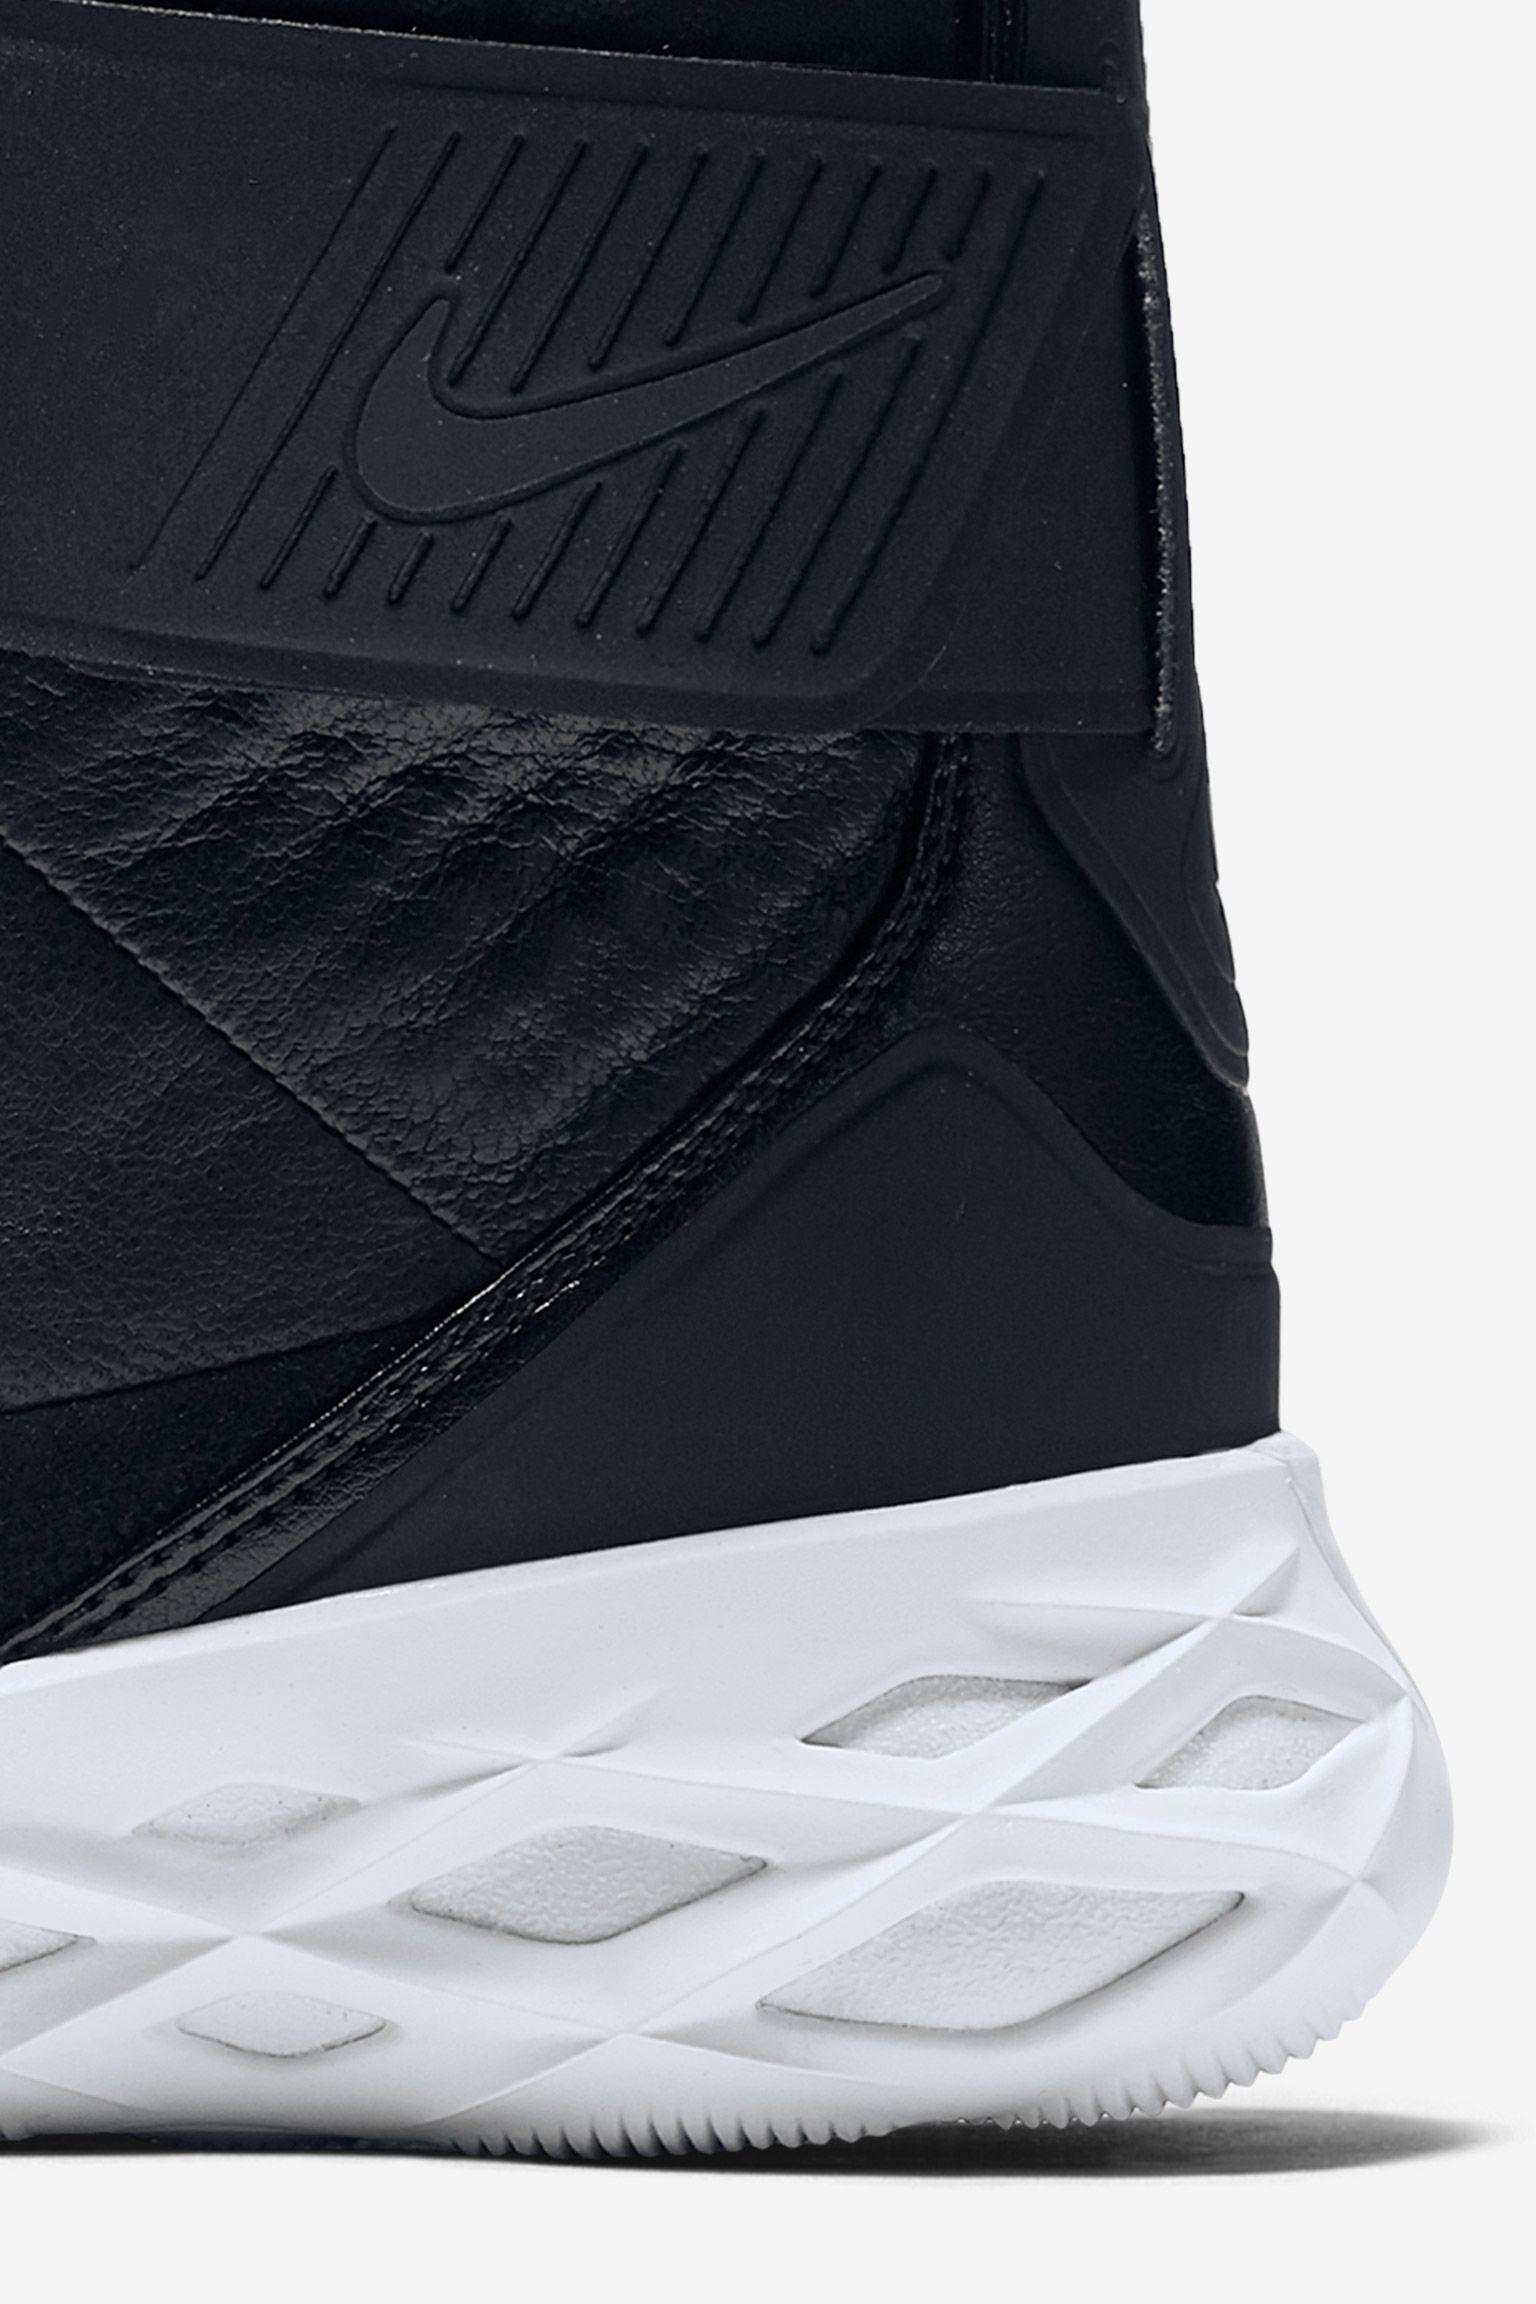 Nike Swoosh HNTR 'On The Hunt' Black